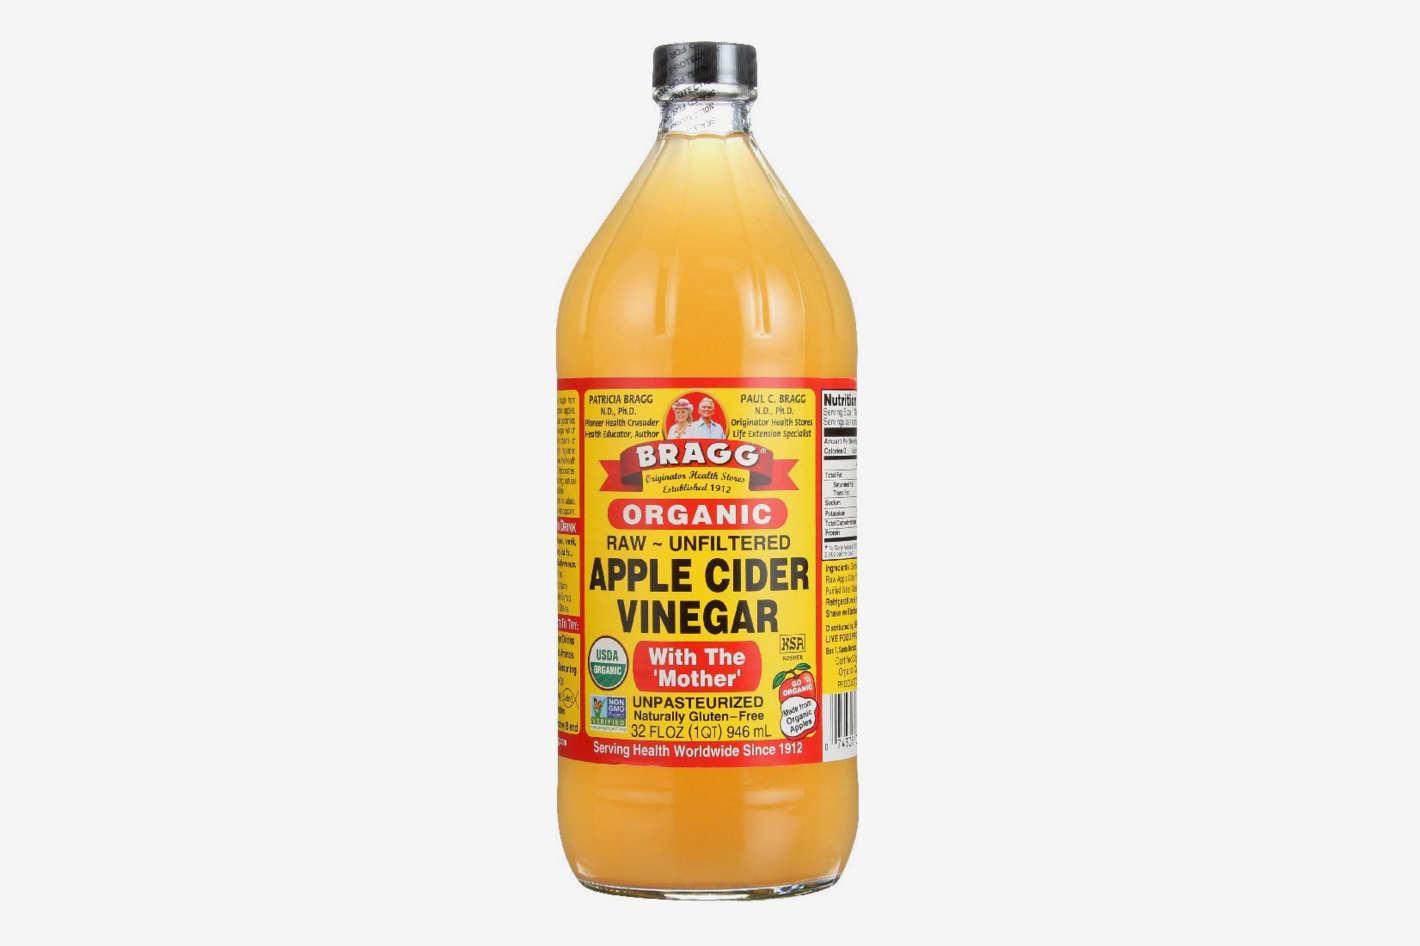 Bragg Organic Apple Cider Vinegar, Raw & Unfiltered